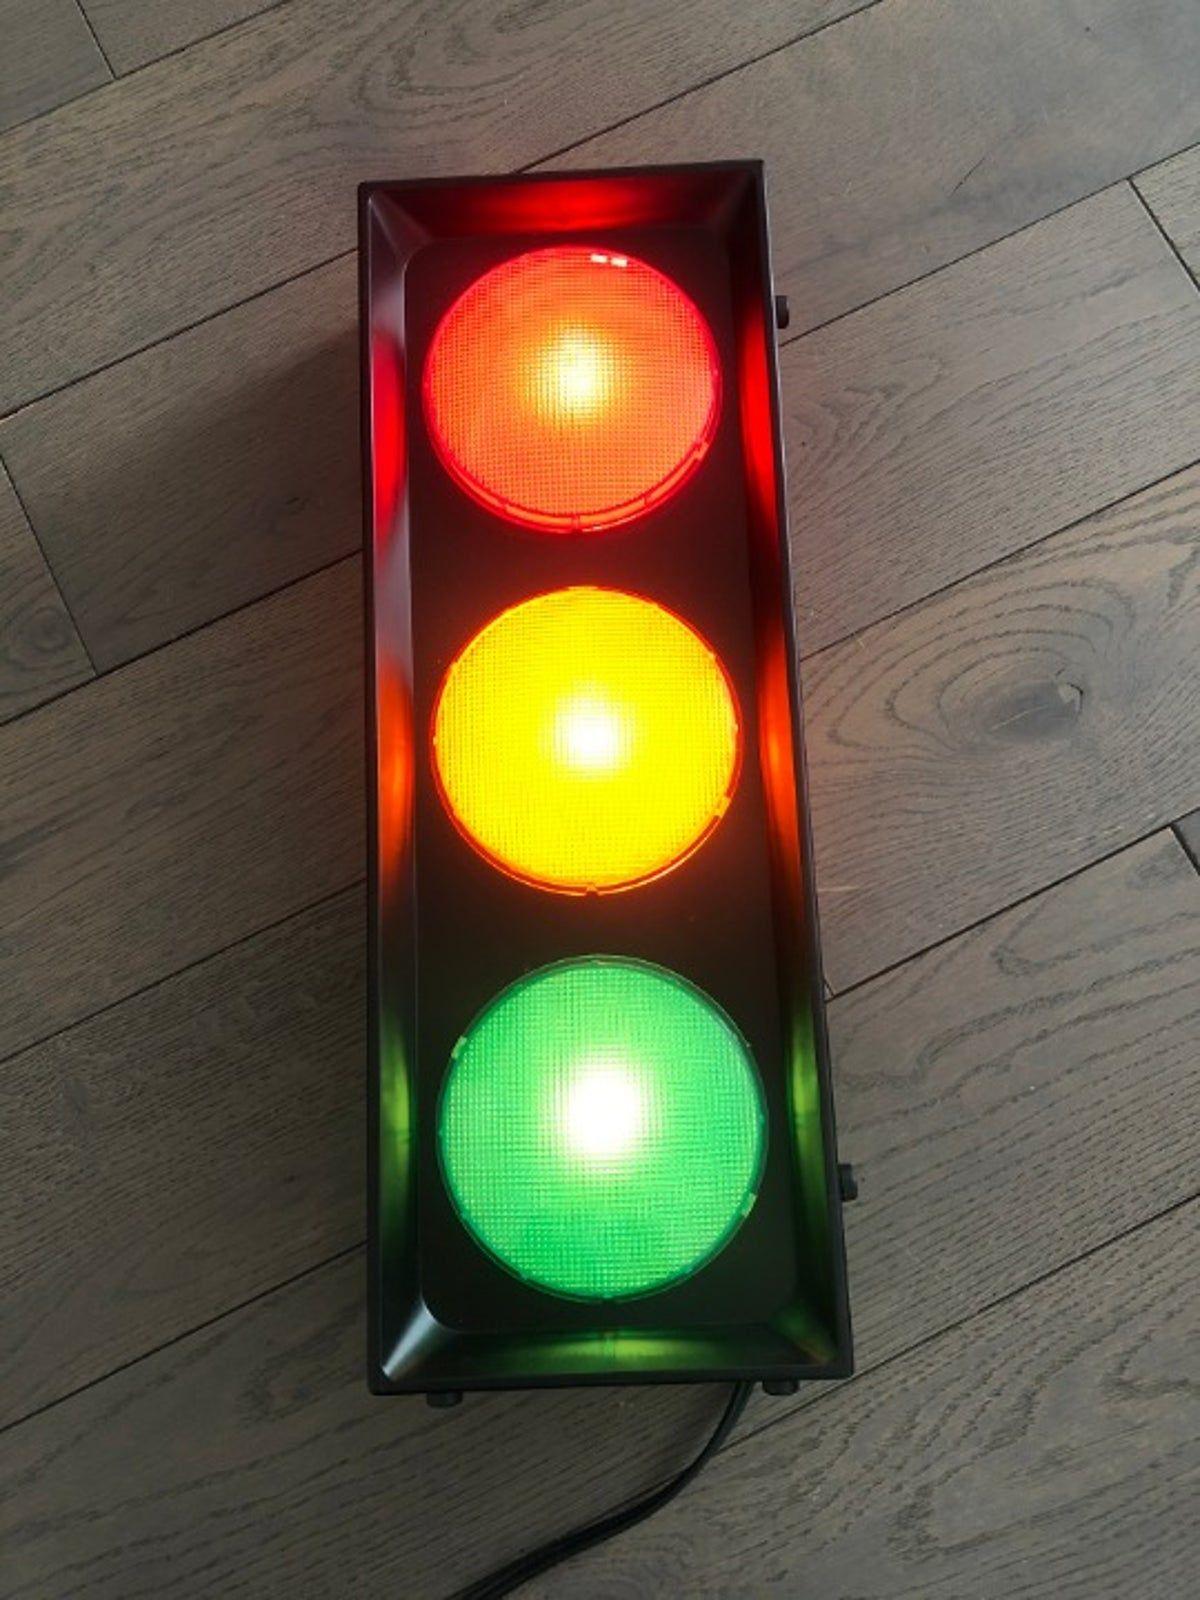 Traffic Light Stop Light Traffic Lite In 2020 Stop Light Light Traffic Light